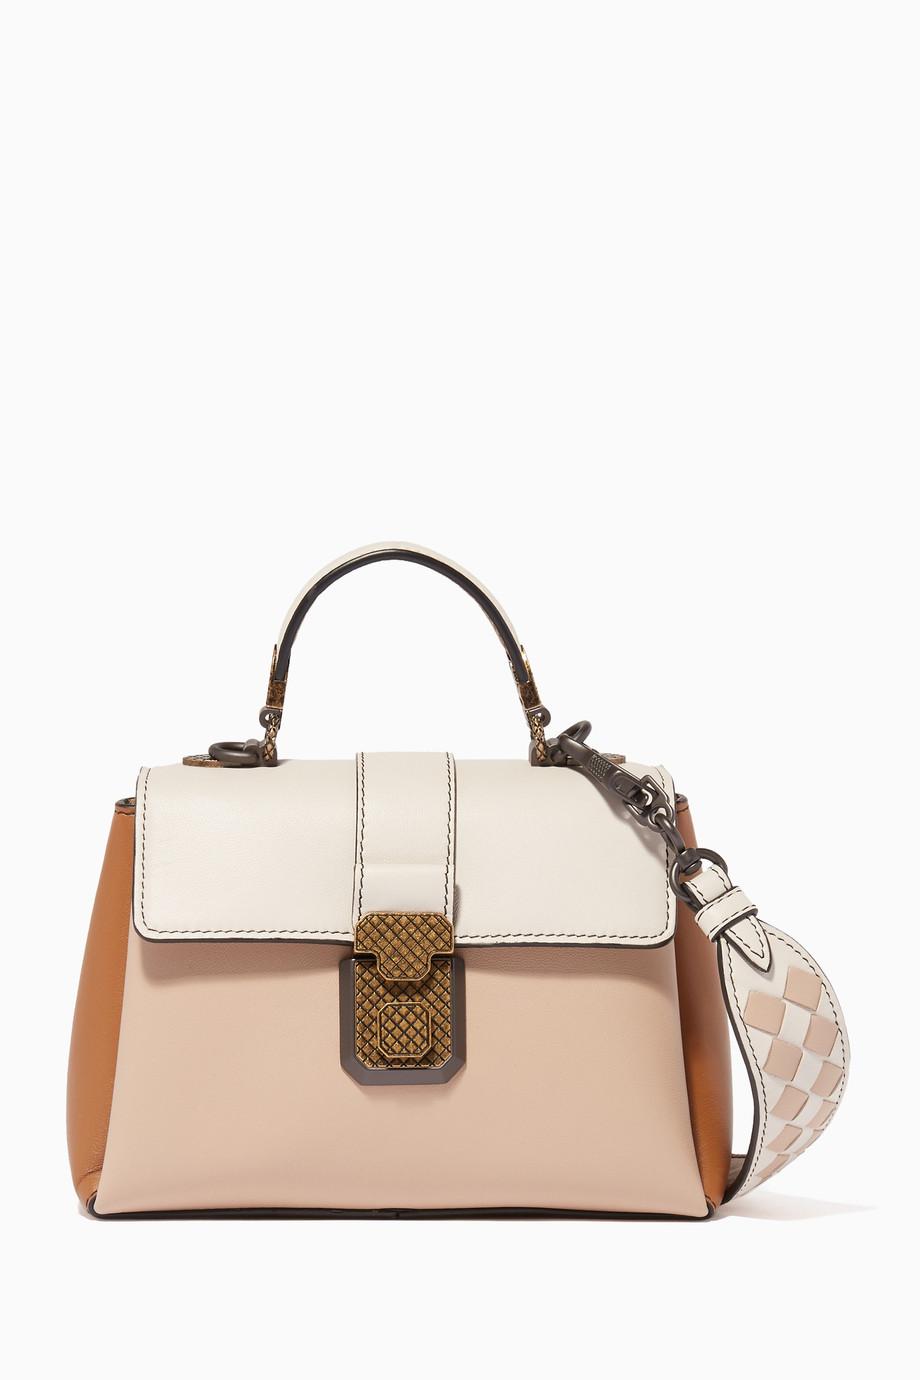 7d46b336b0c9 Shop Bottega Veneta Neutral Beige Mini Nappa Piazza Cross-Body Bag ...